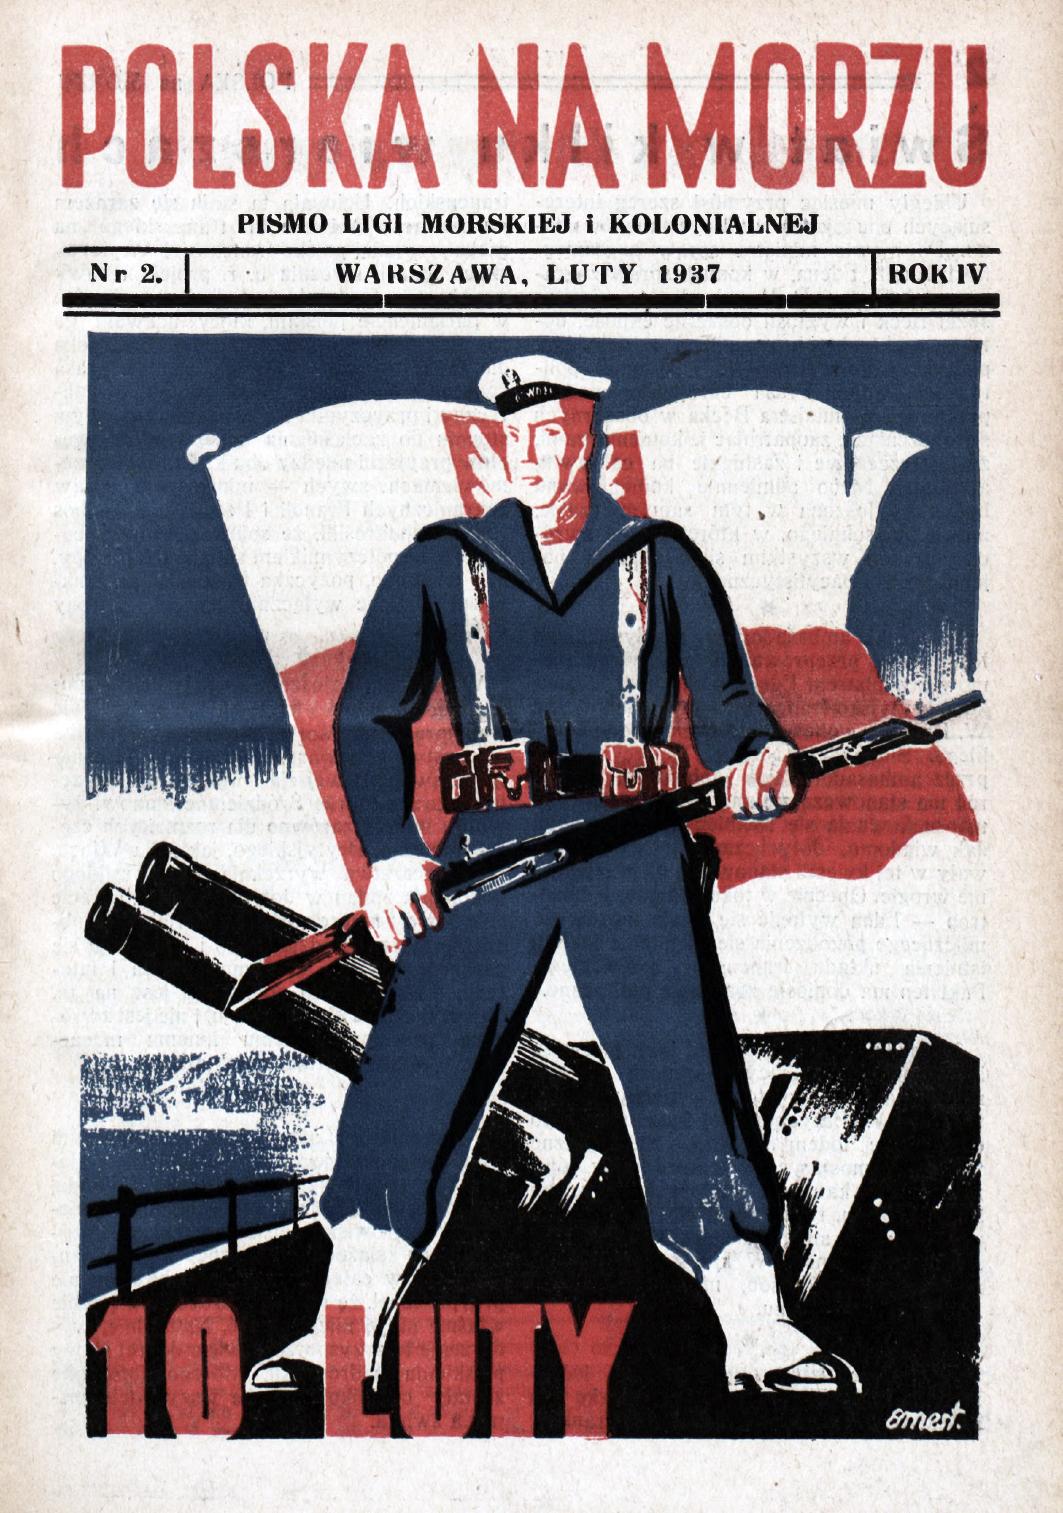 Polska na Morzu : pismo Ligi Morskiej i Kolonjalnej. - Liga Morska i Kolonjalna, 1937, nr 2